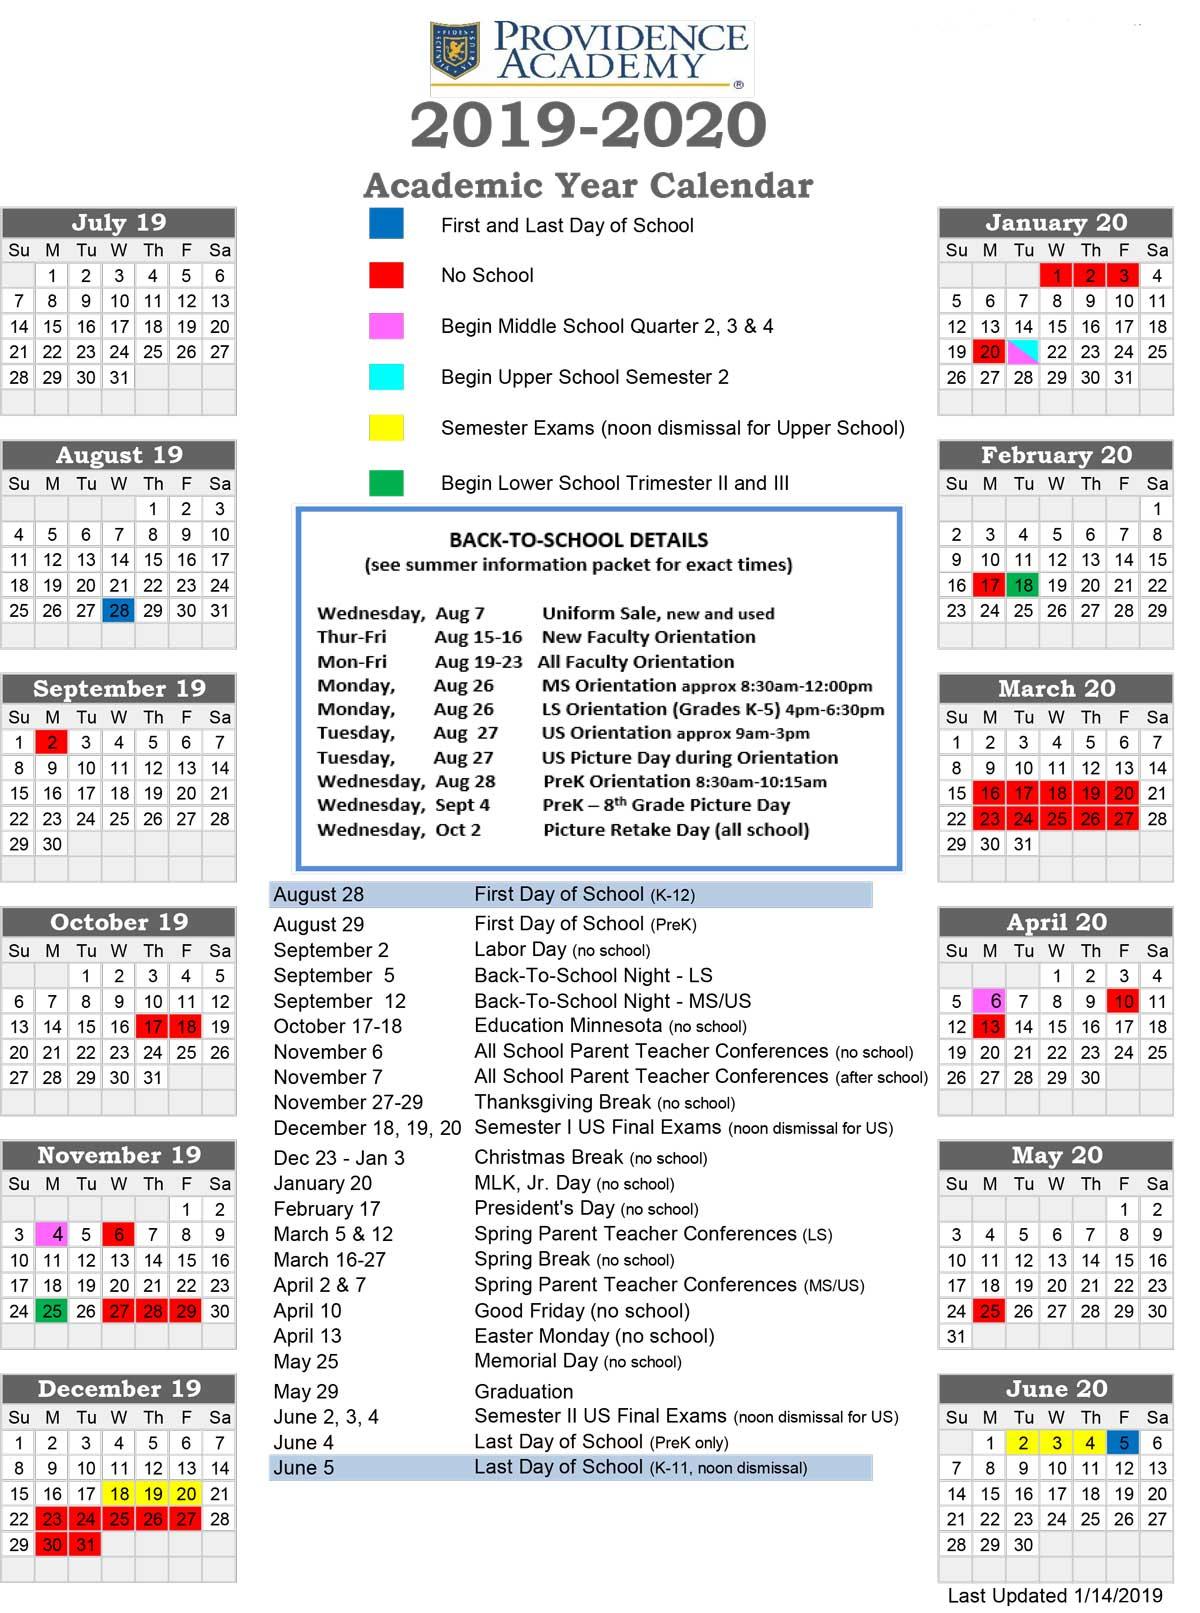 Academic Calendar - Providence Academy Pertaining To Calendar For University Of Minnesota Twin Cities Campus